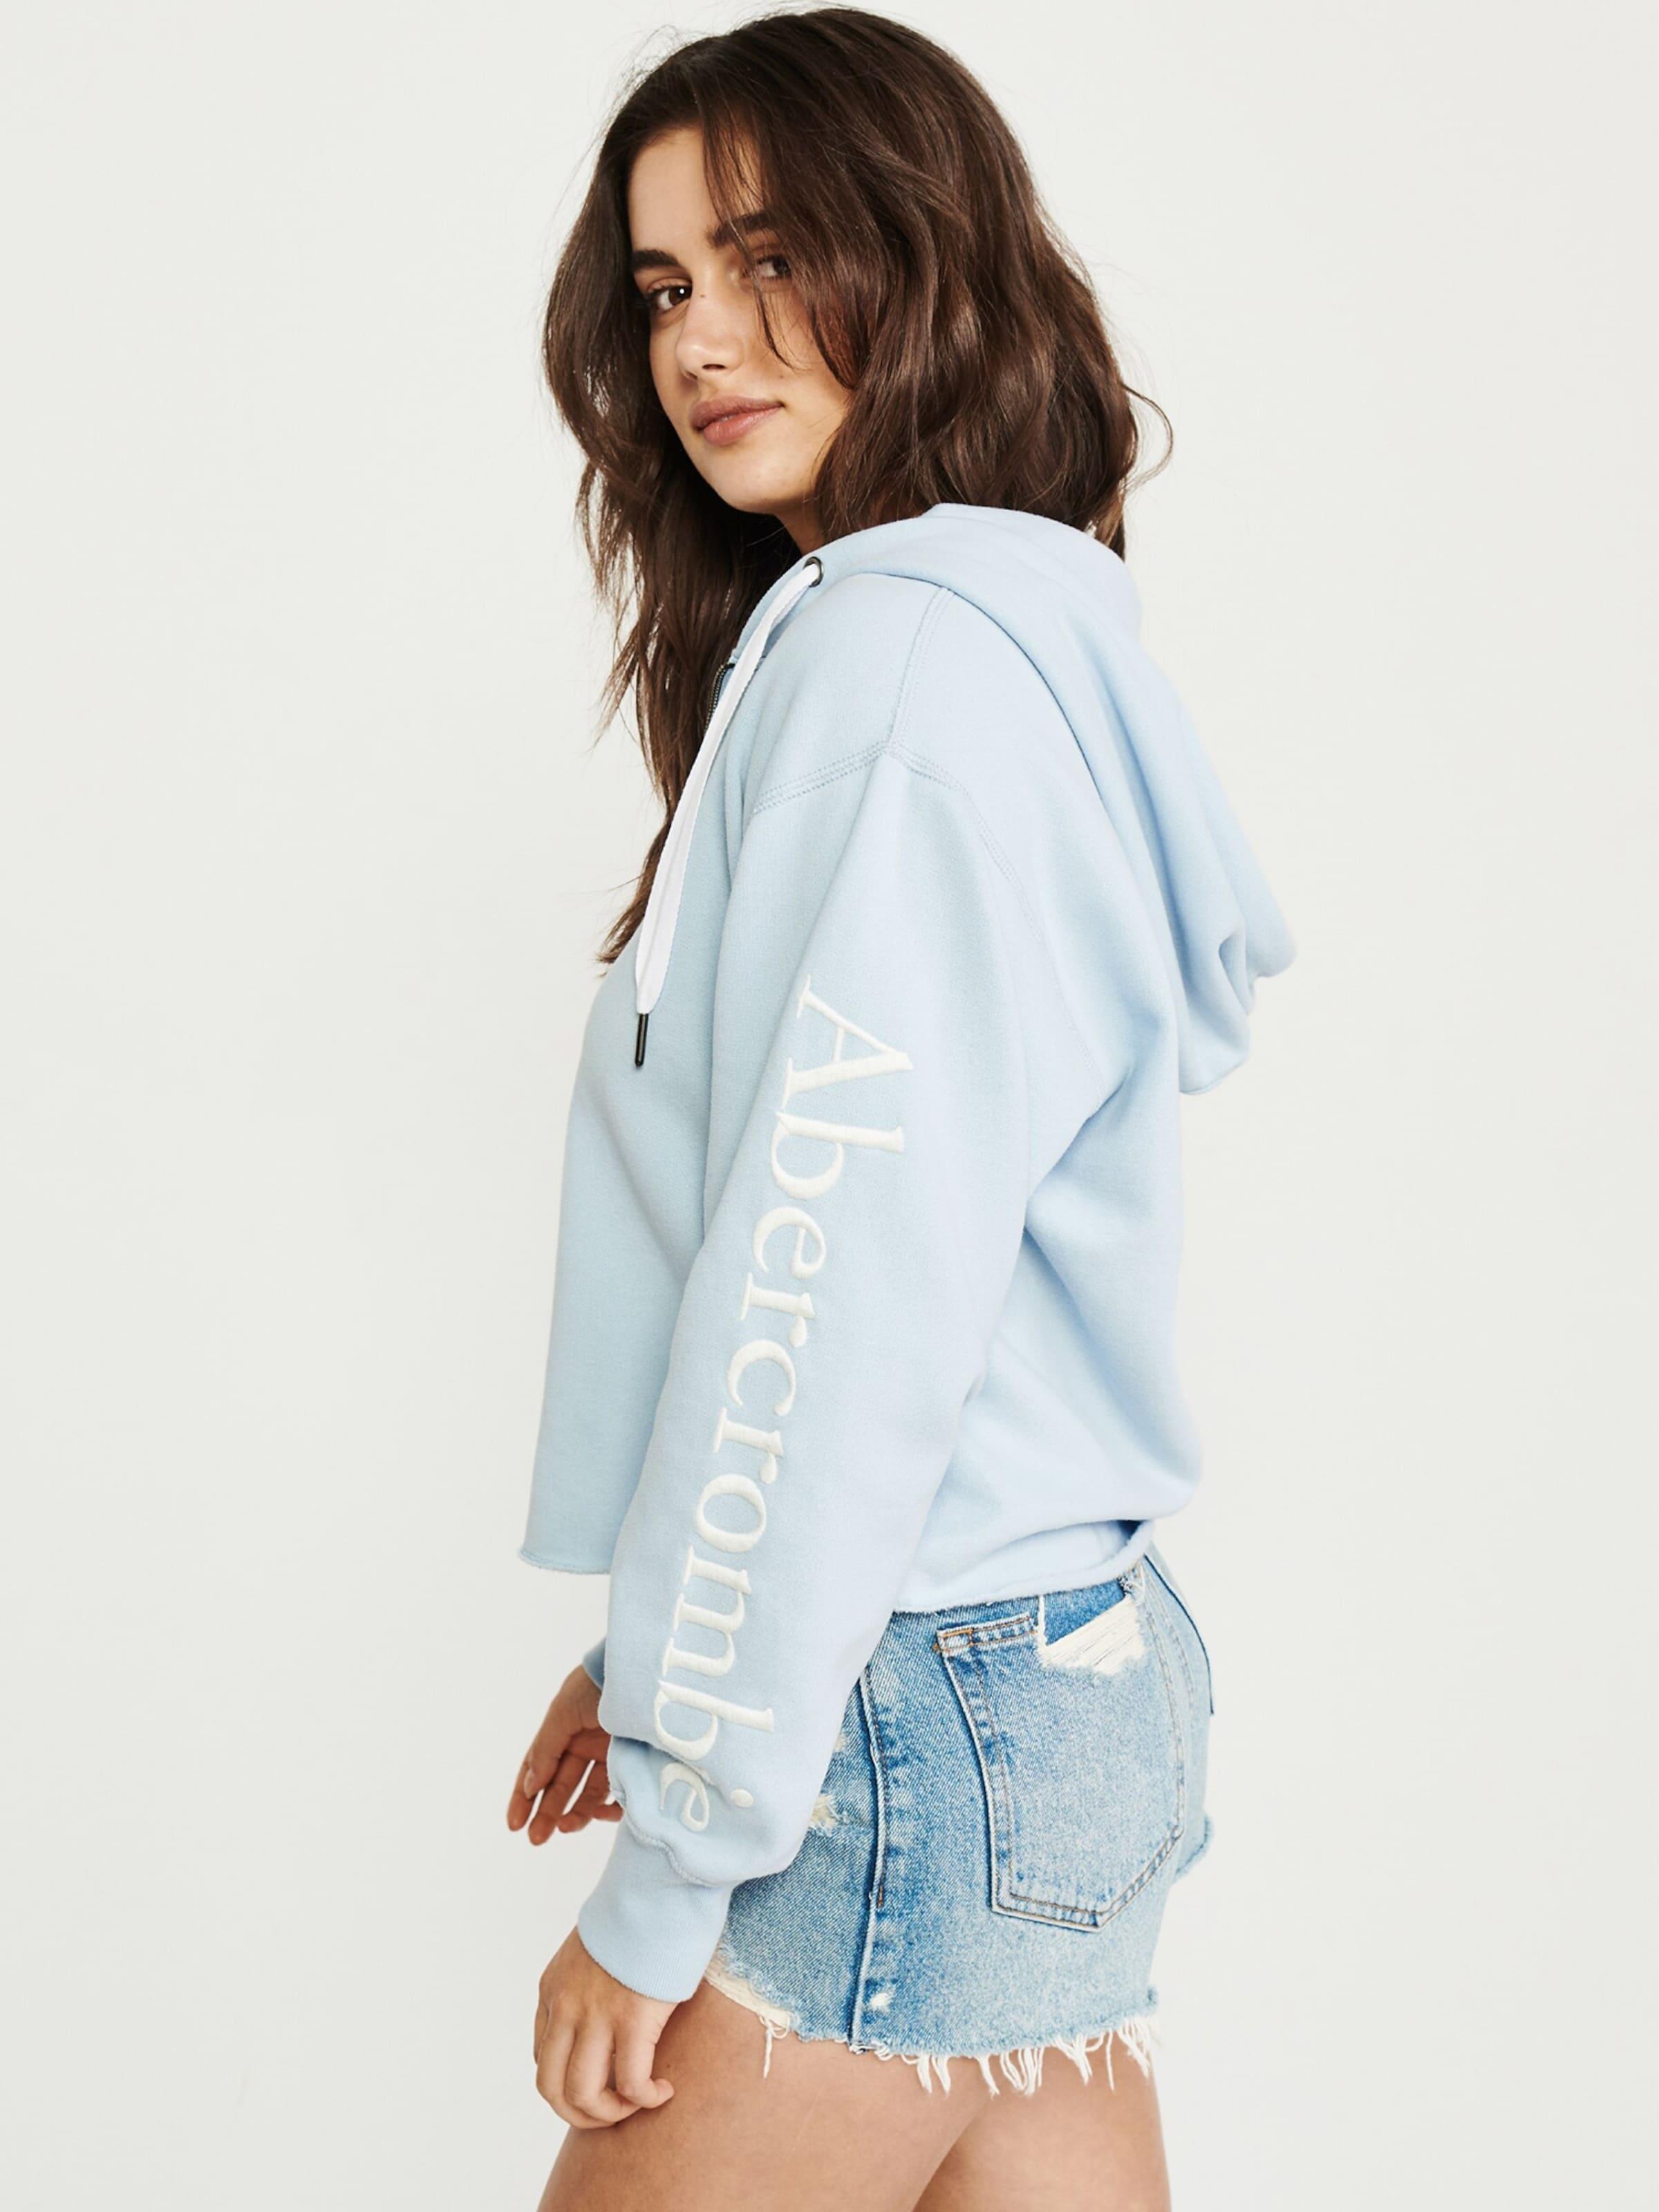 Fitch En Bleu Clair Sweat shirt Abercrombieamp; vYfIg7yb6